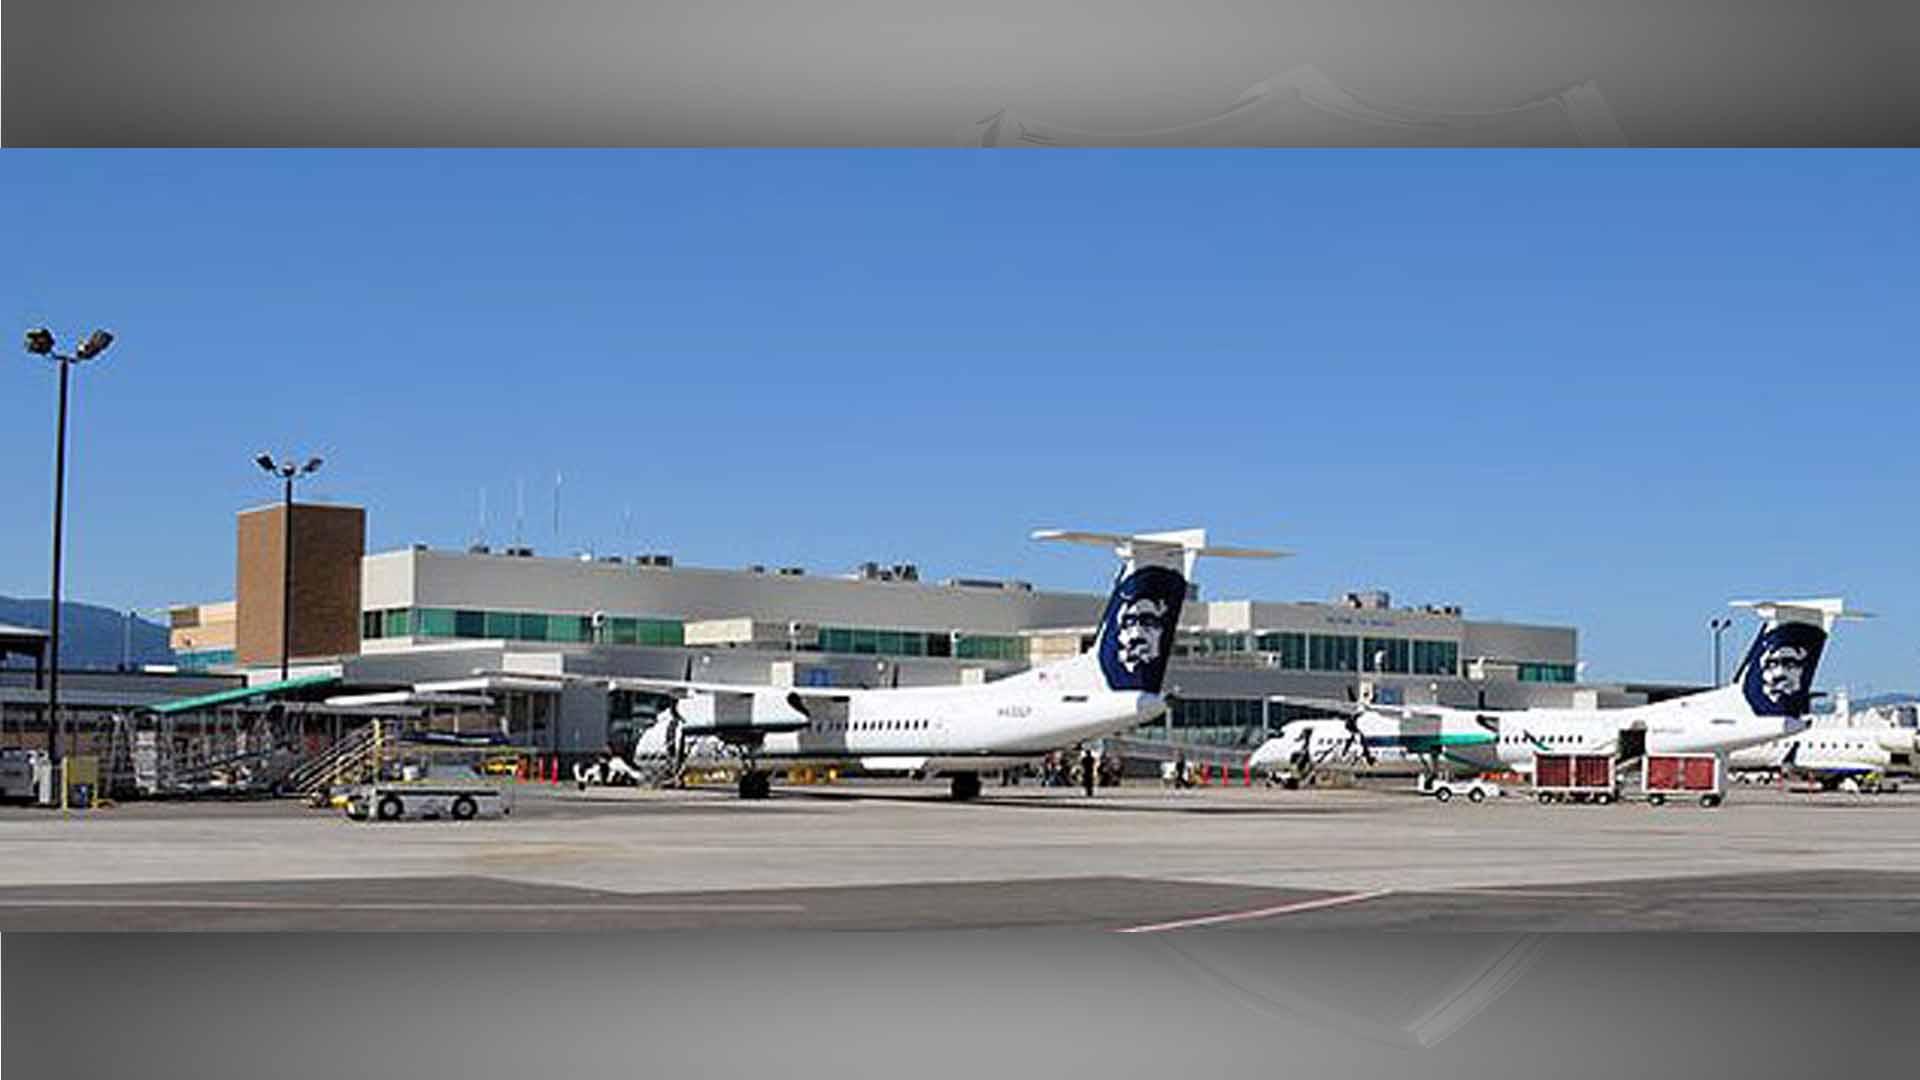 Gas Prices In California >> Medford's airport announces regular service to L.A., Phoenix - KOBI-TV NBC5 / KOTI-TV NBC2